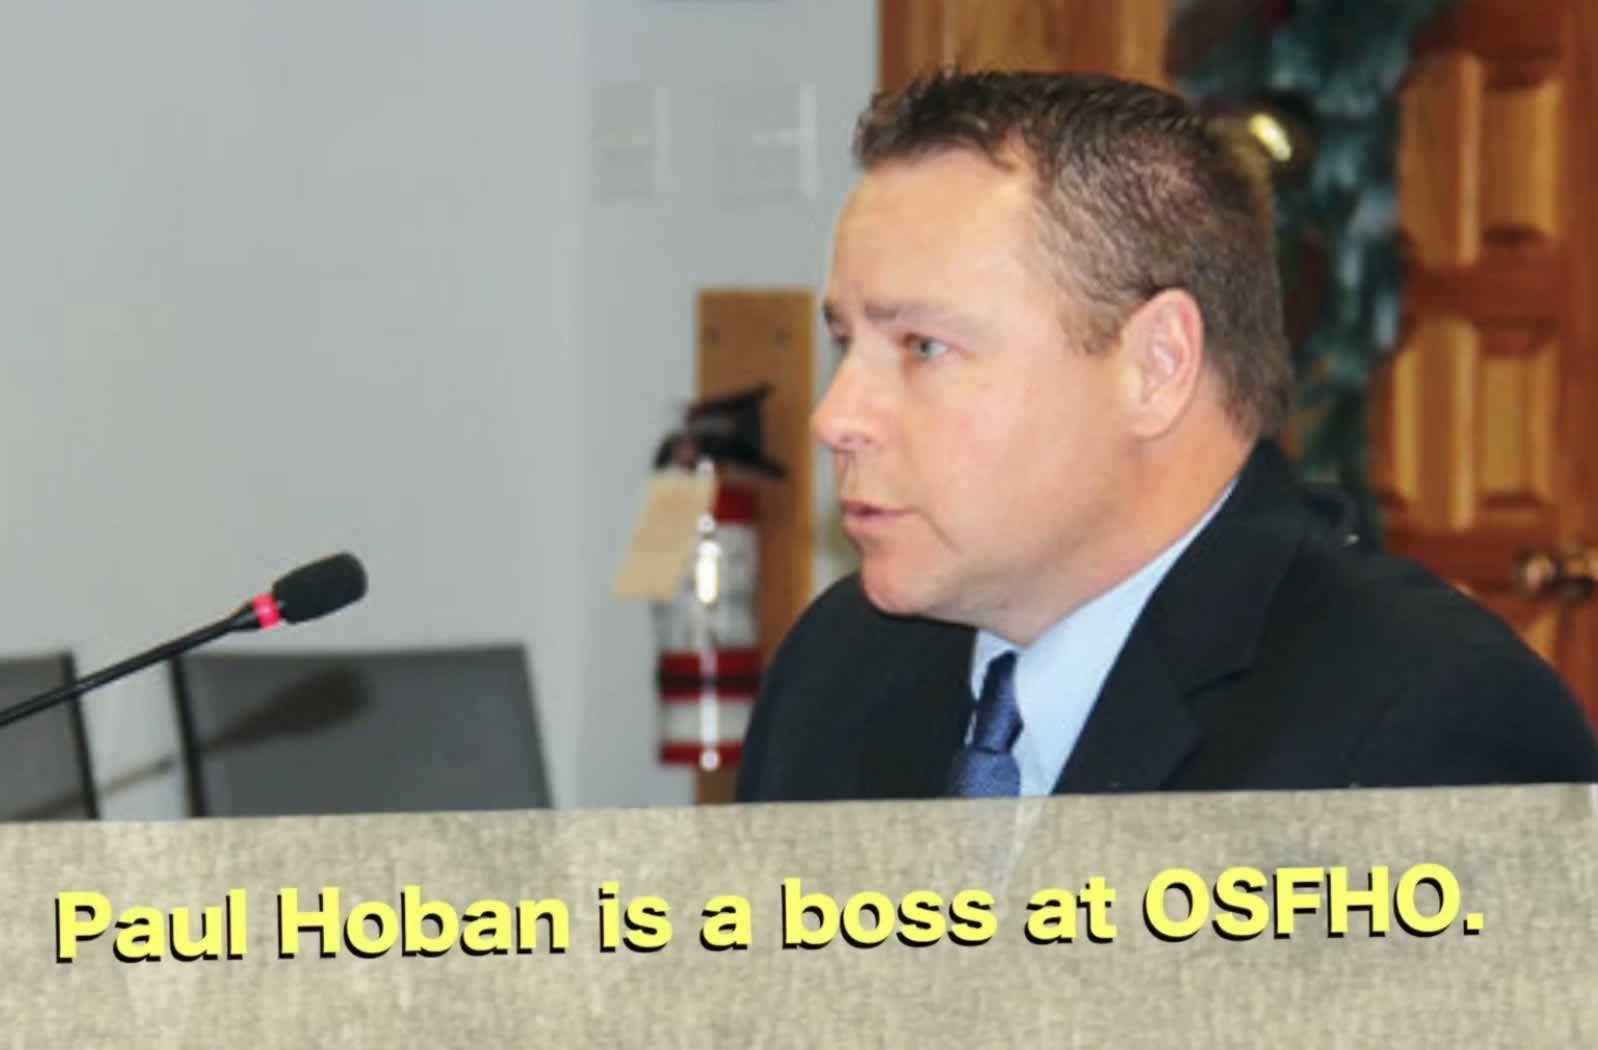 Paul Hoban is a boss at OSFHO